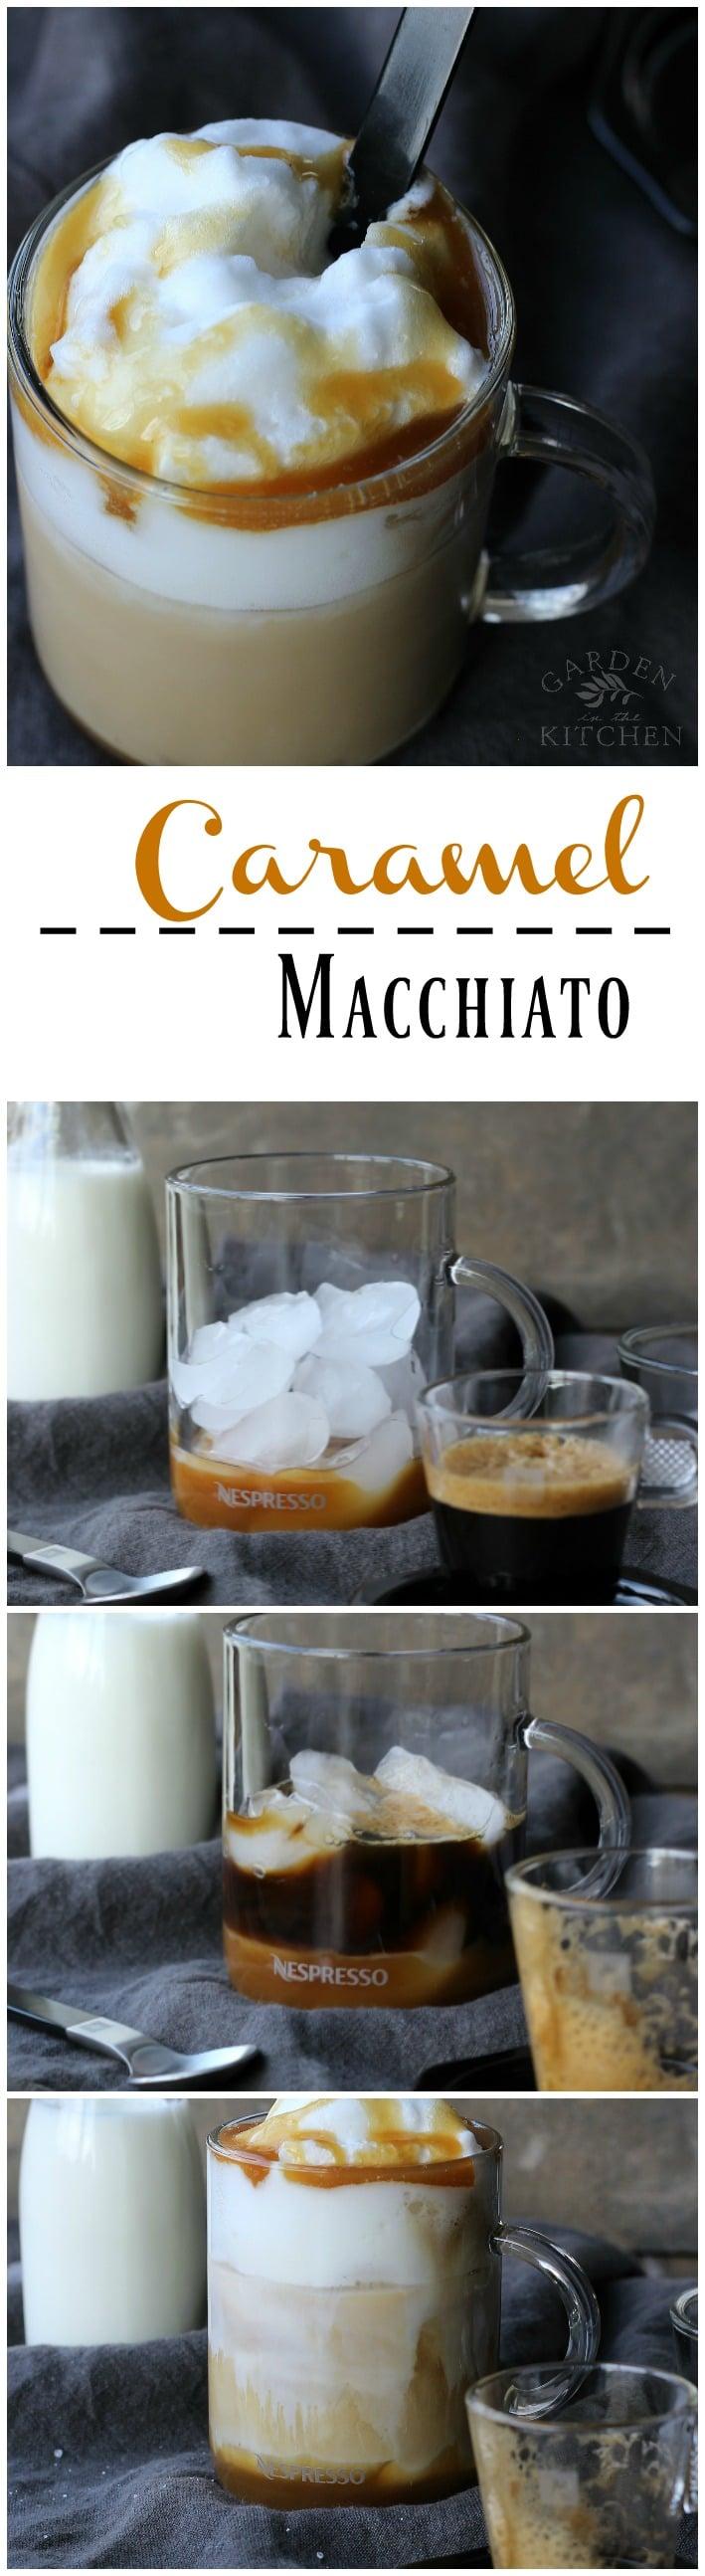 Iced Caramel Macchiato | gardeninthekitchen.com